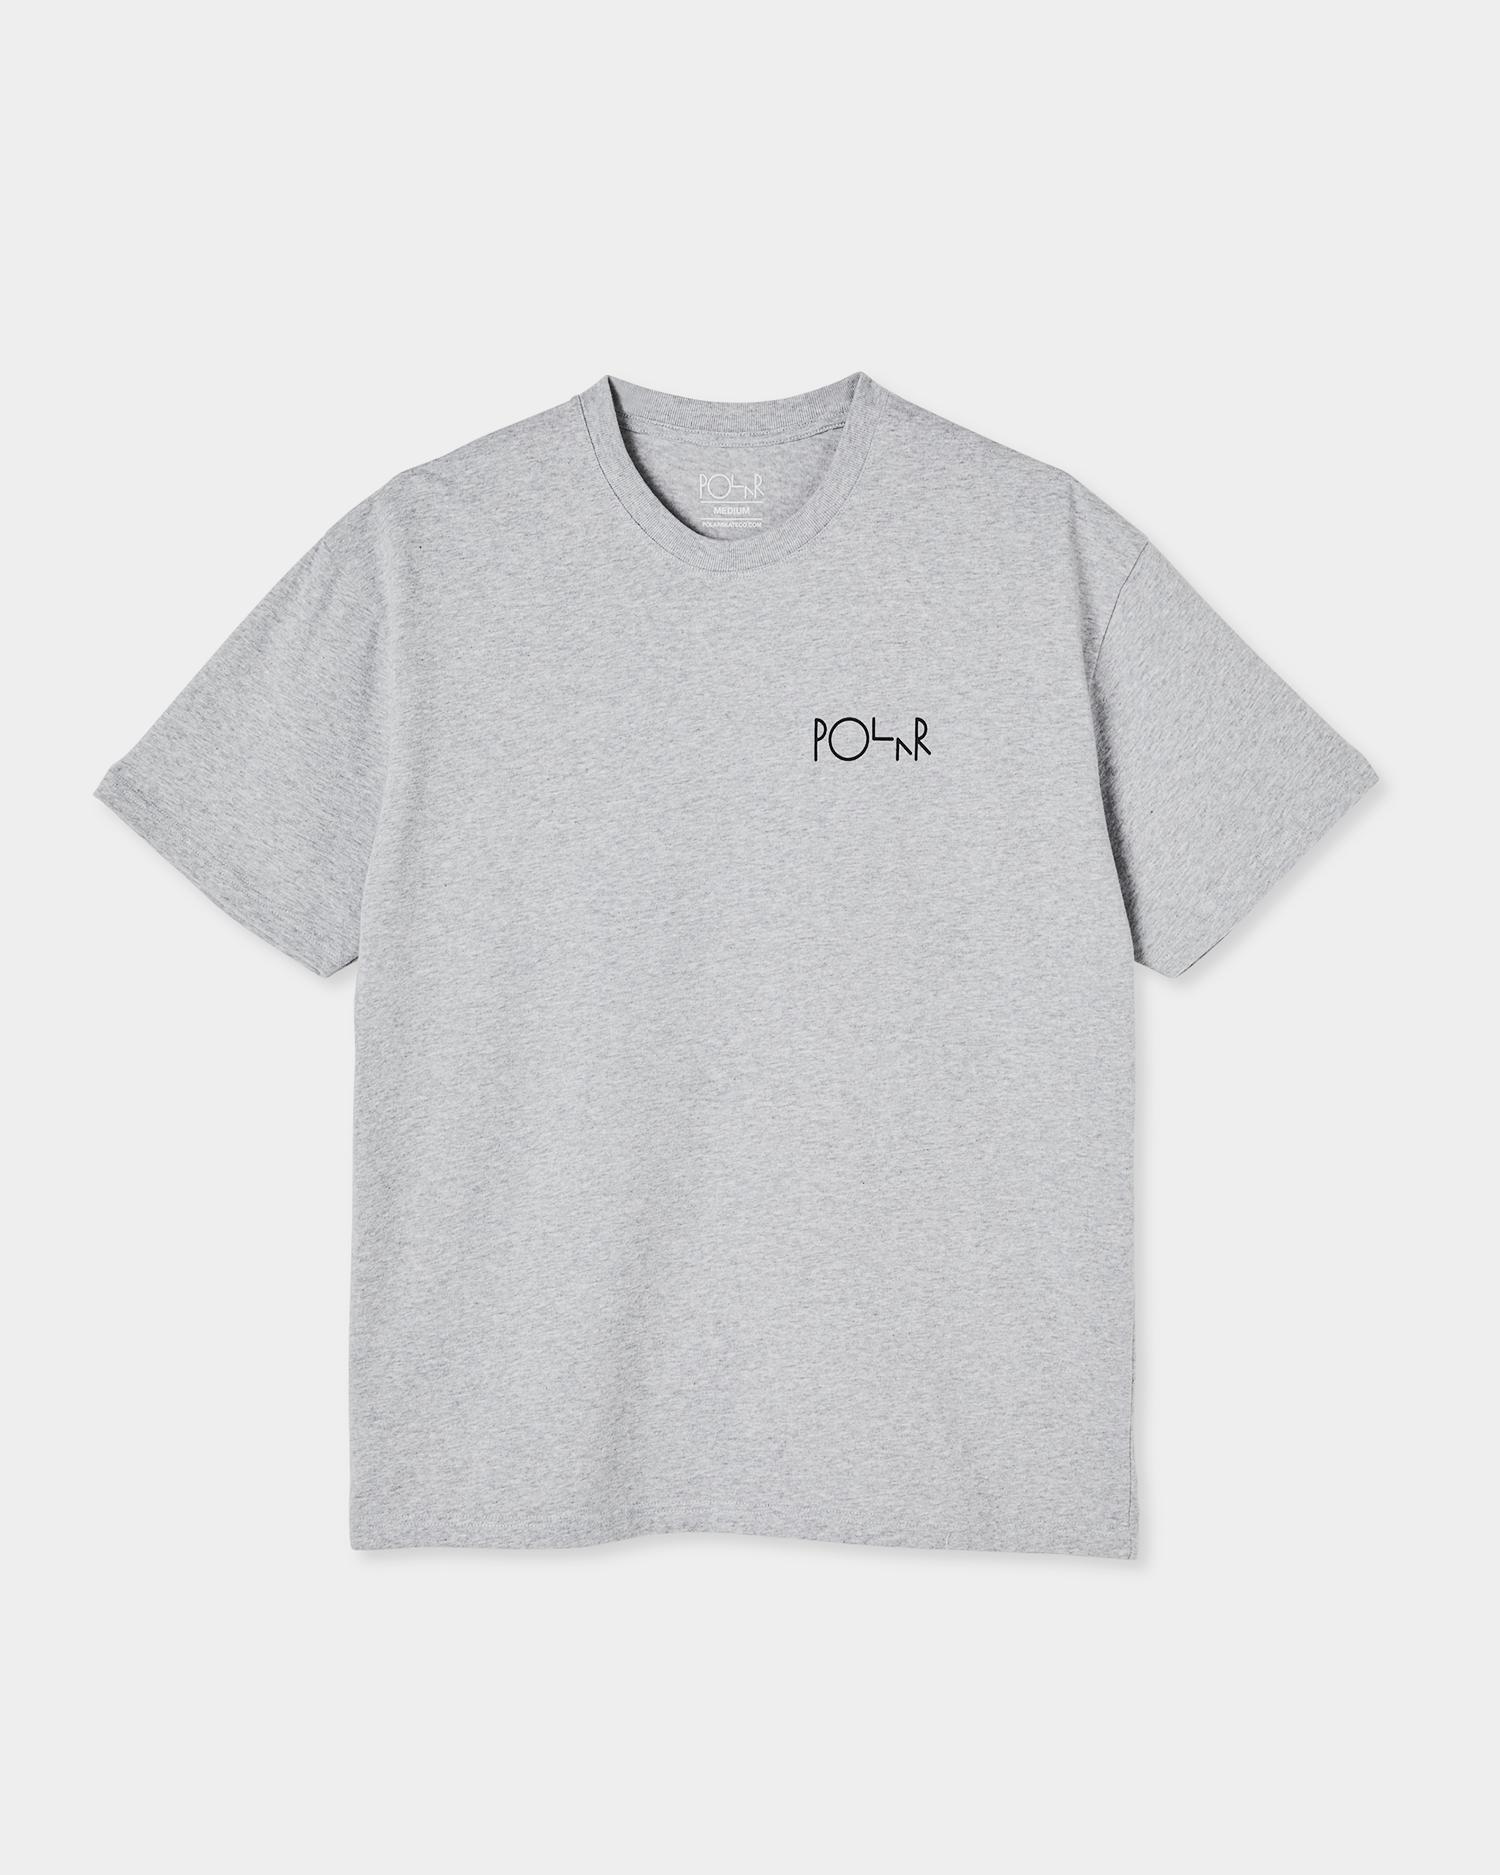 Polar 3 Tone Fill Logo Tee Sport Grey